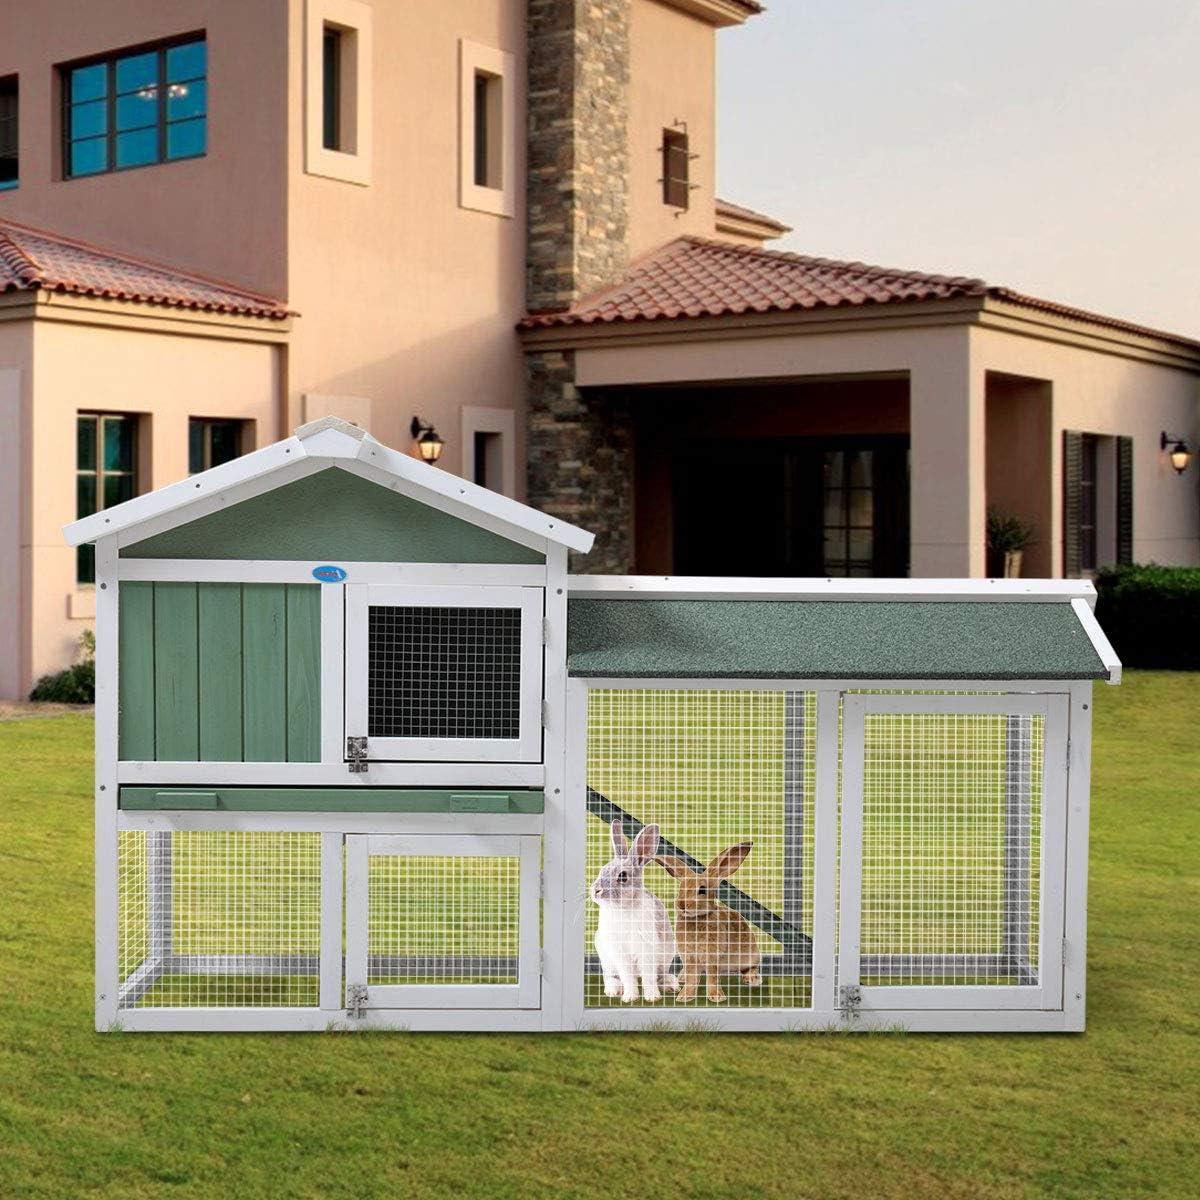 "16+ Buy JAXPETY New 8""Chicken Coop Wooden Bunny Rabbit Hutch w/Ramp ... Kollektion"